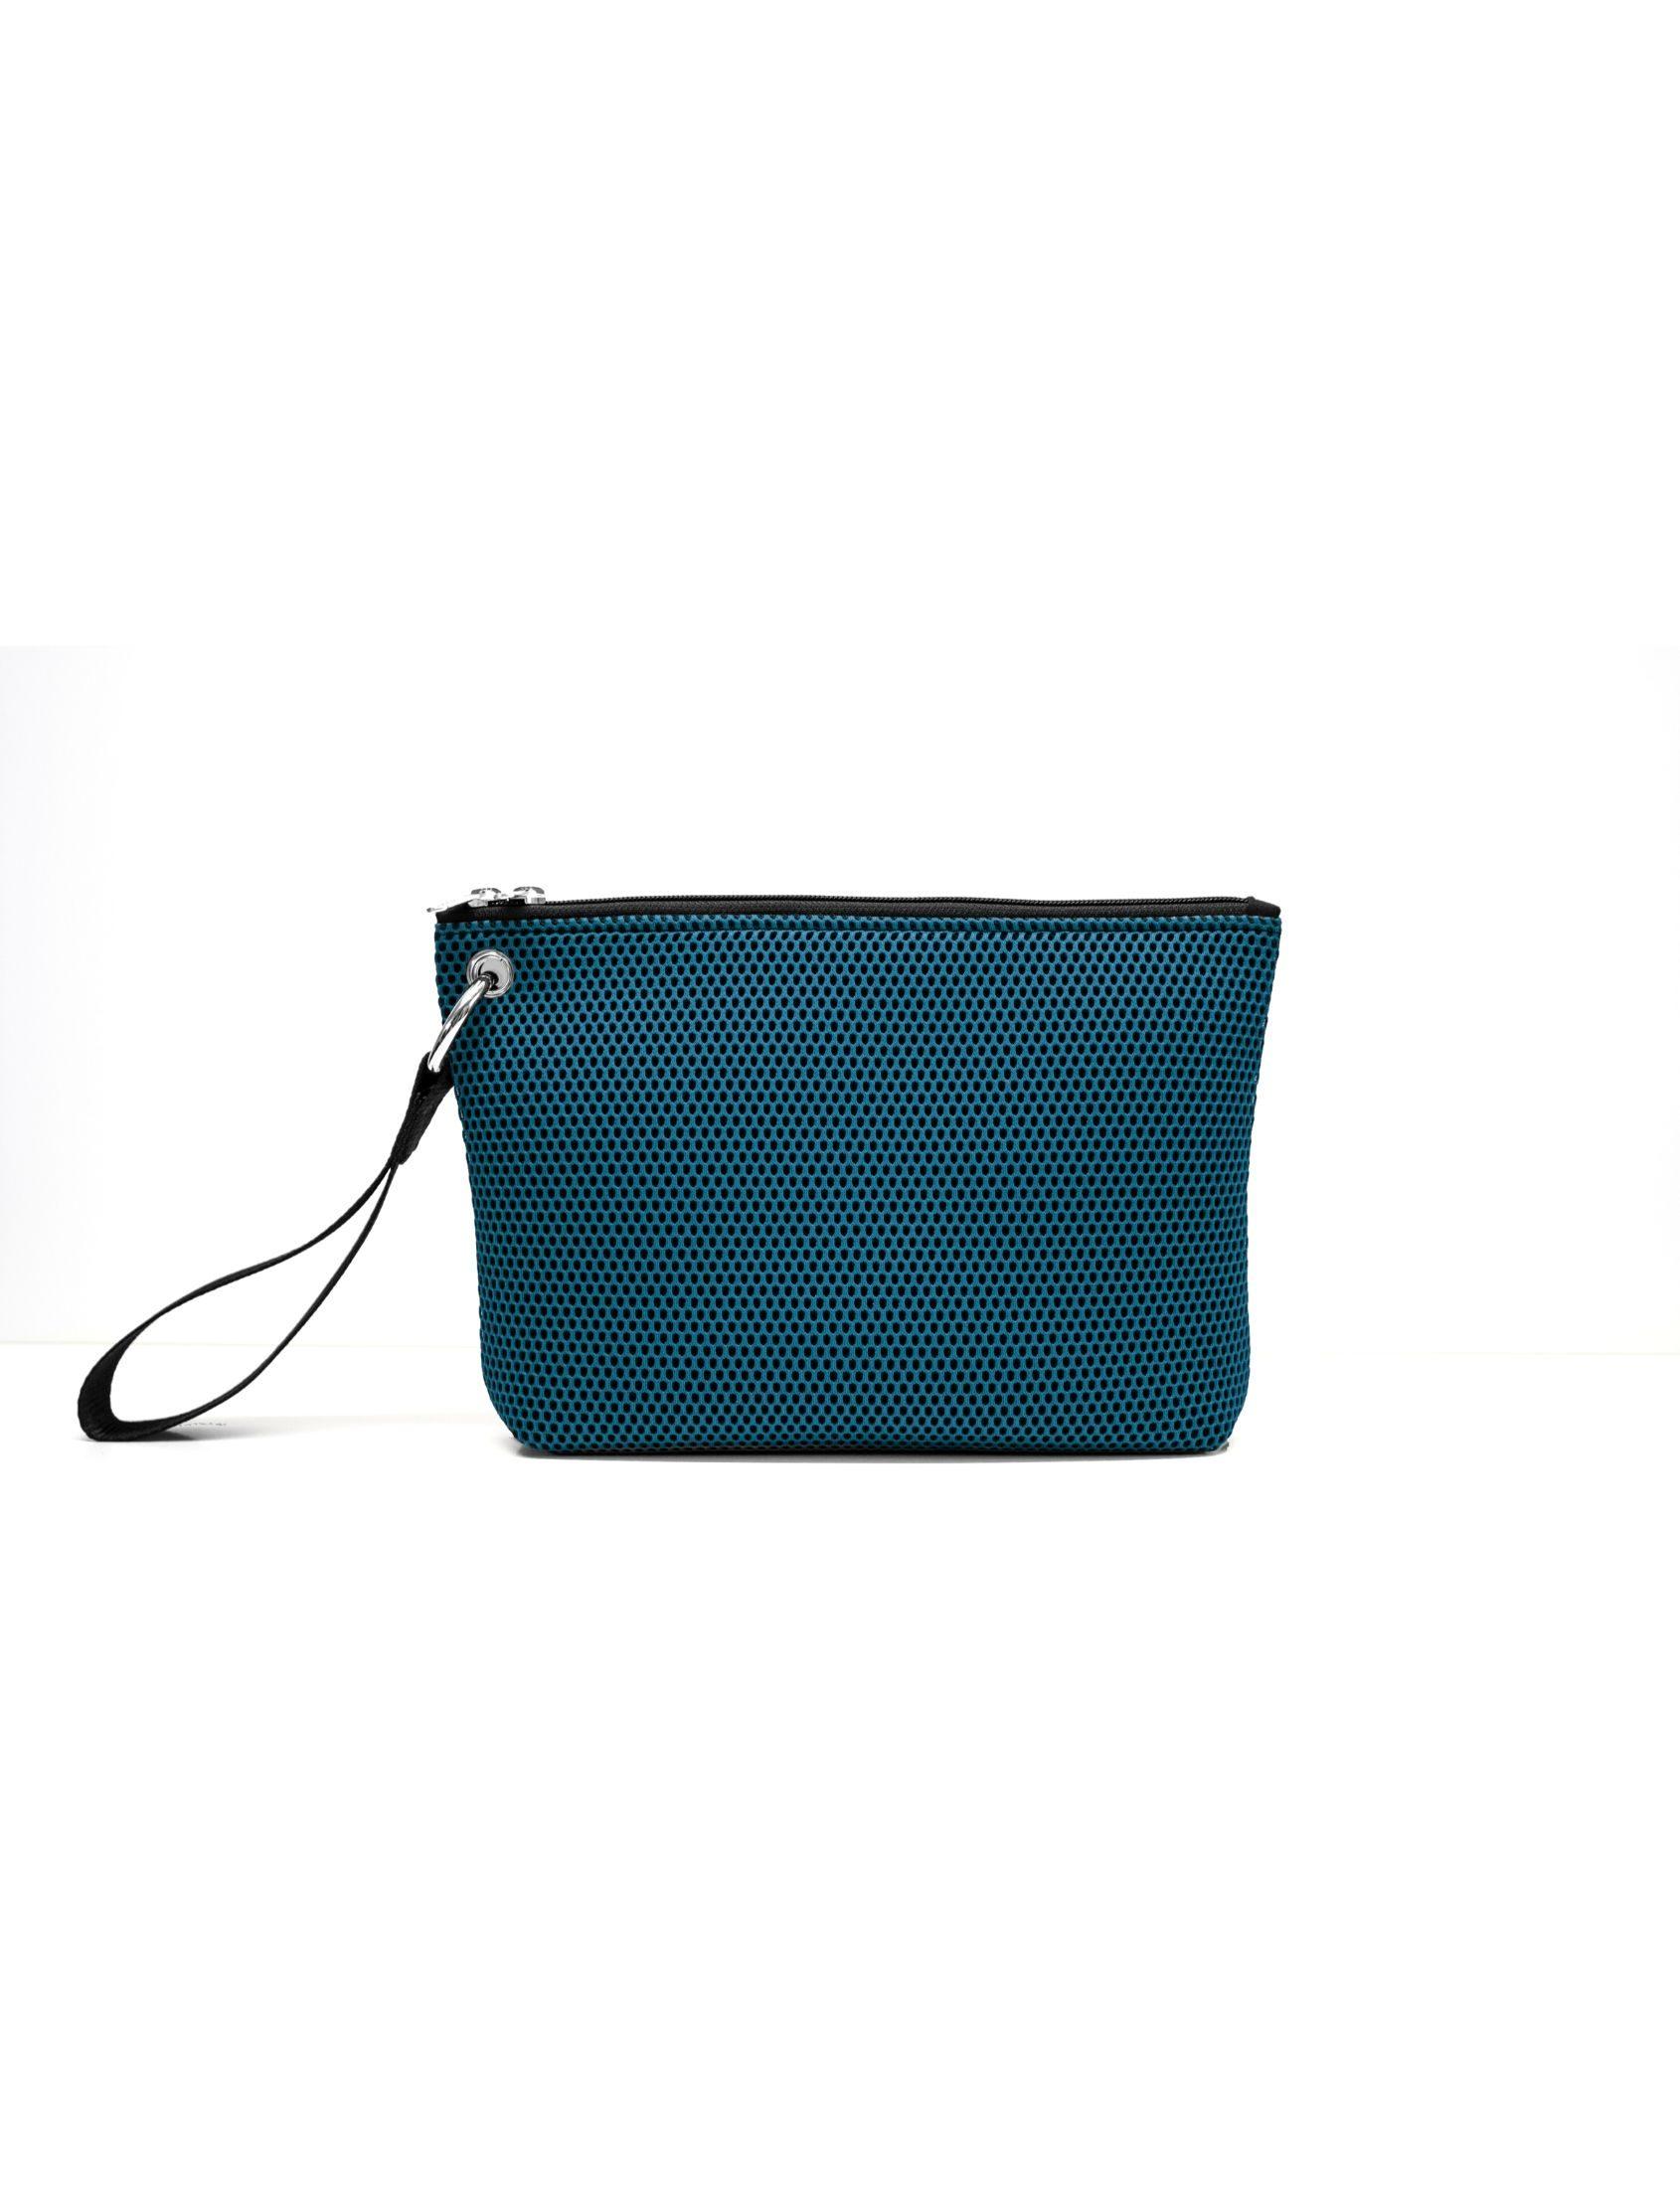 bolso de mano de Peter&Wolf con tejido ténico 3d en color azul marino